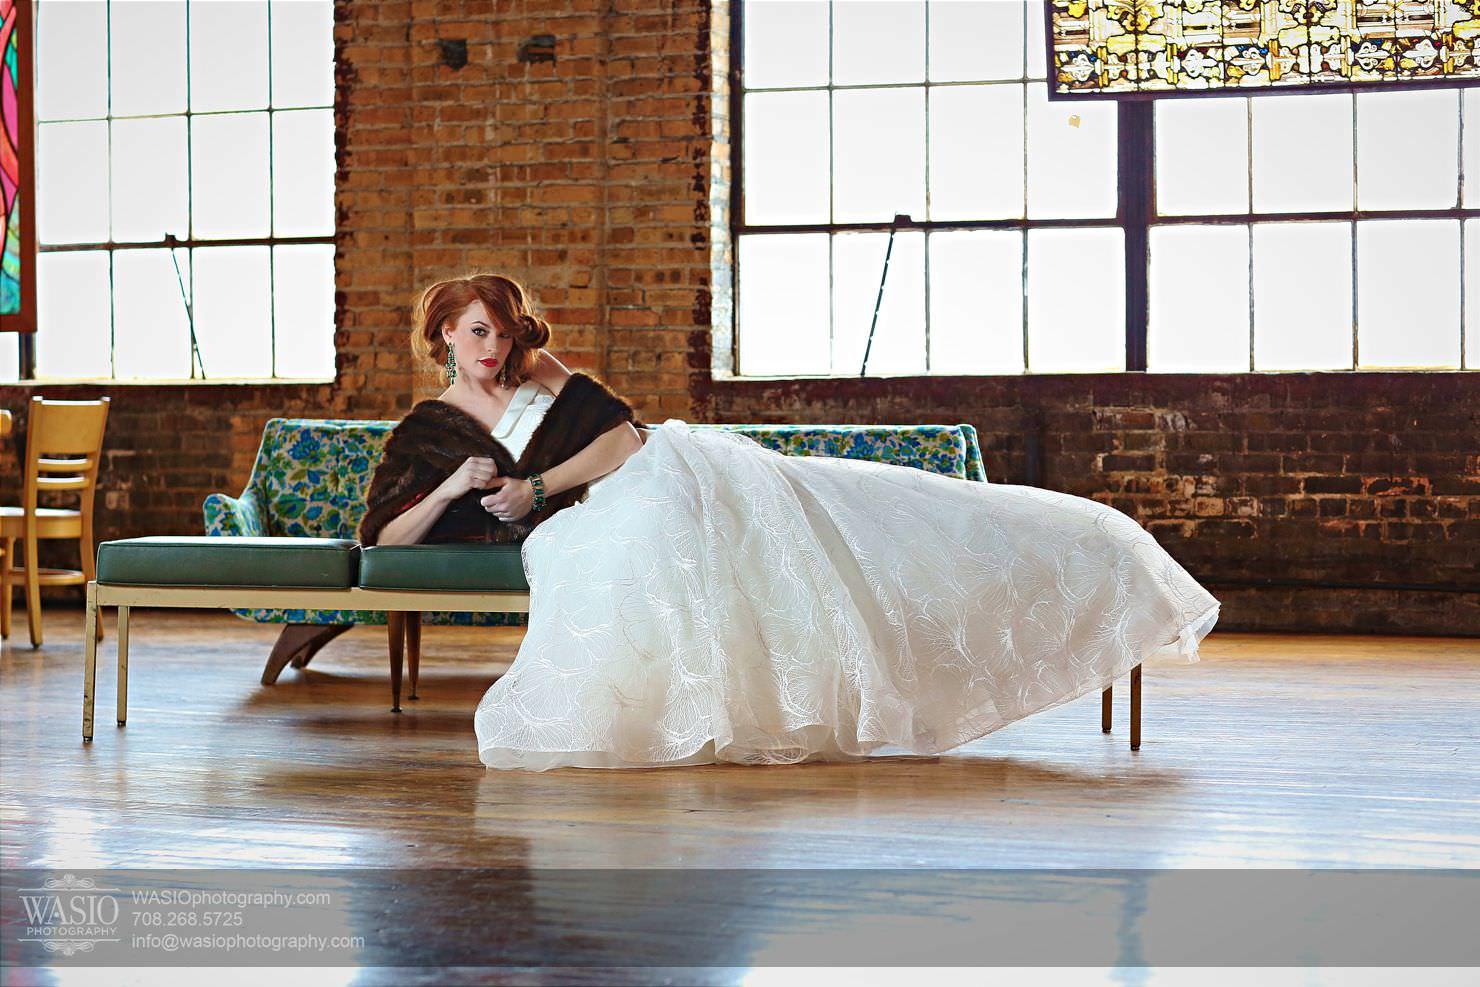 salvage-one-bride-portrait Salvage One - Chicago Vintage Bride